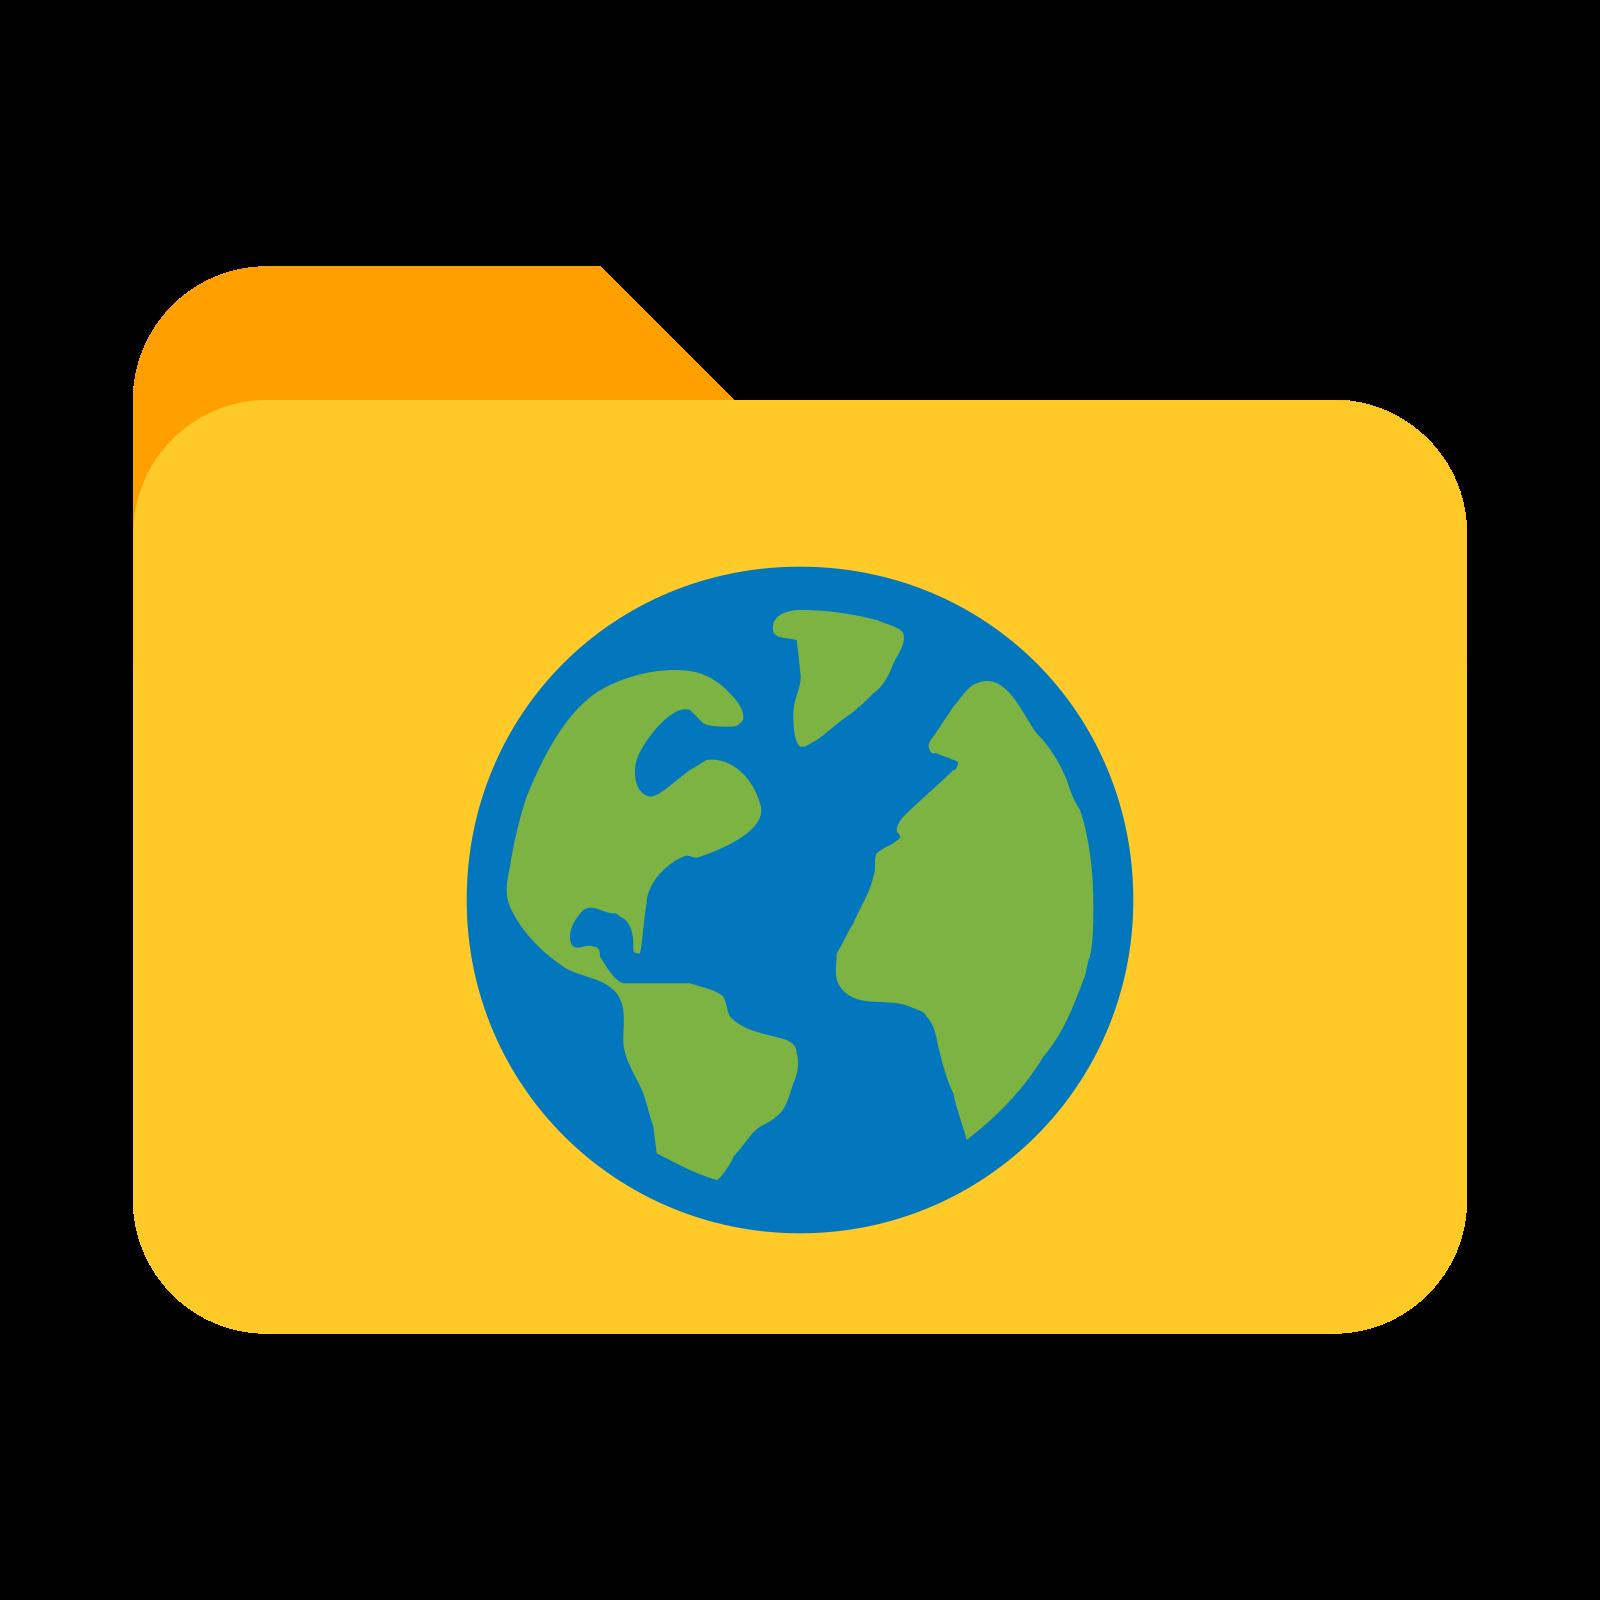 Cartella Internet icon